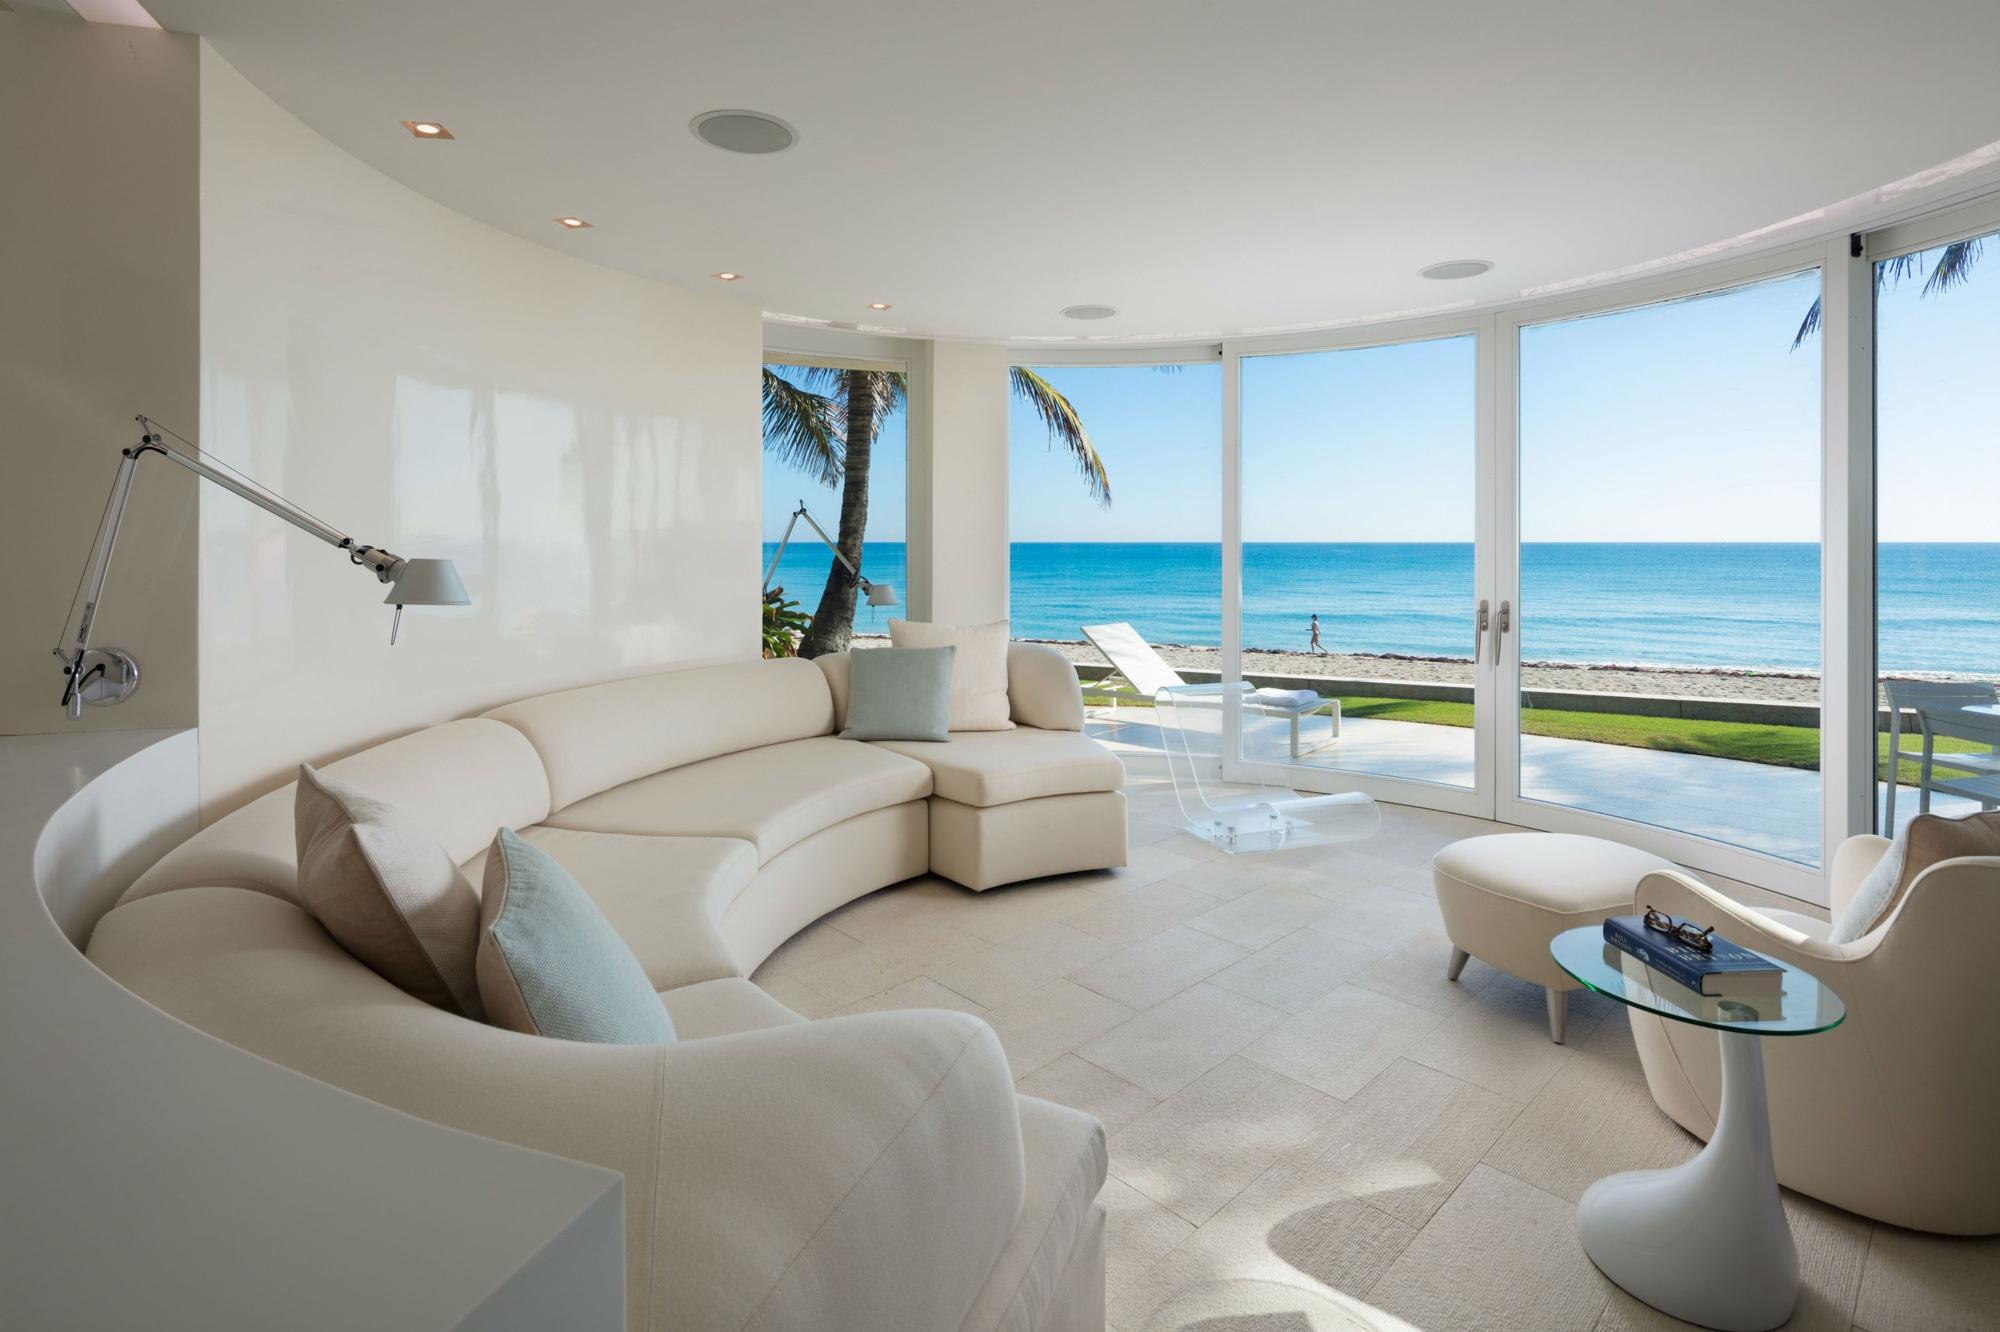 Palm Beach Deco Oceanfront and Cabana Living Room Beach View